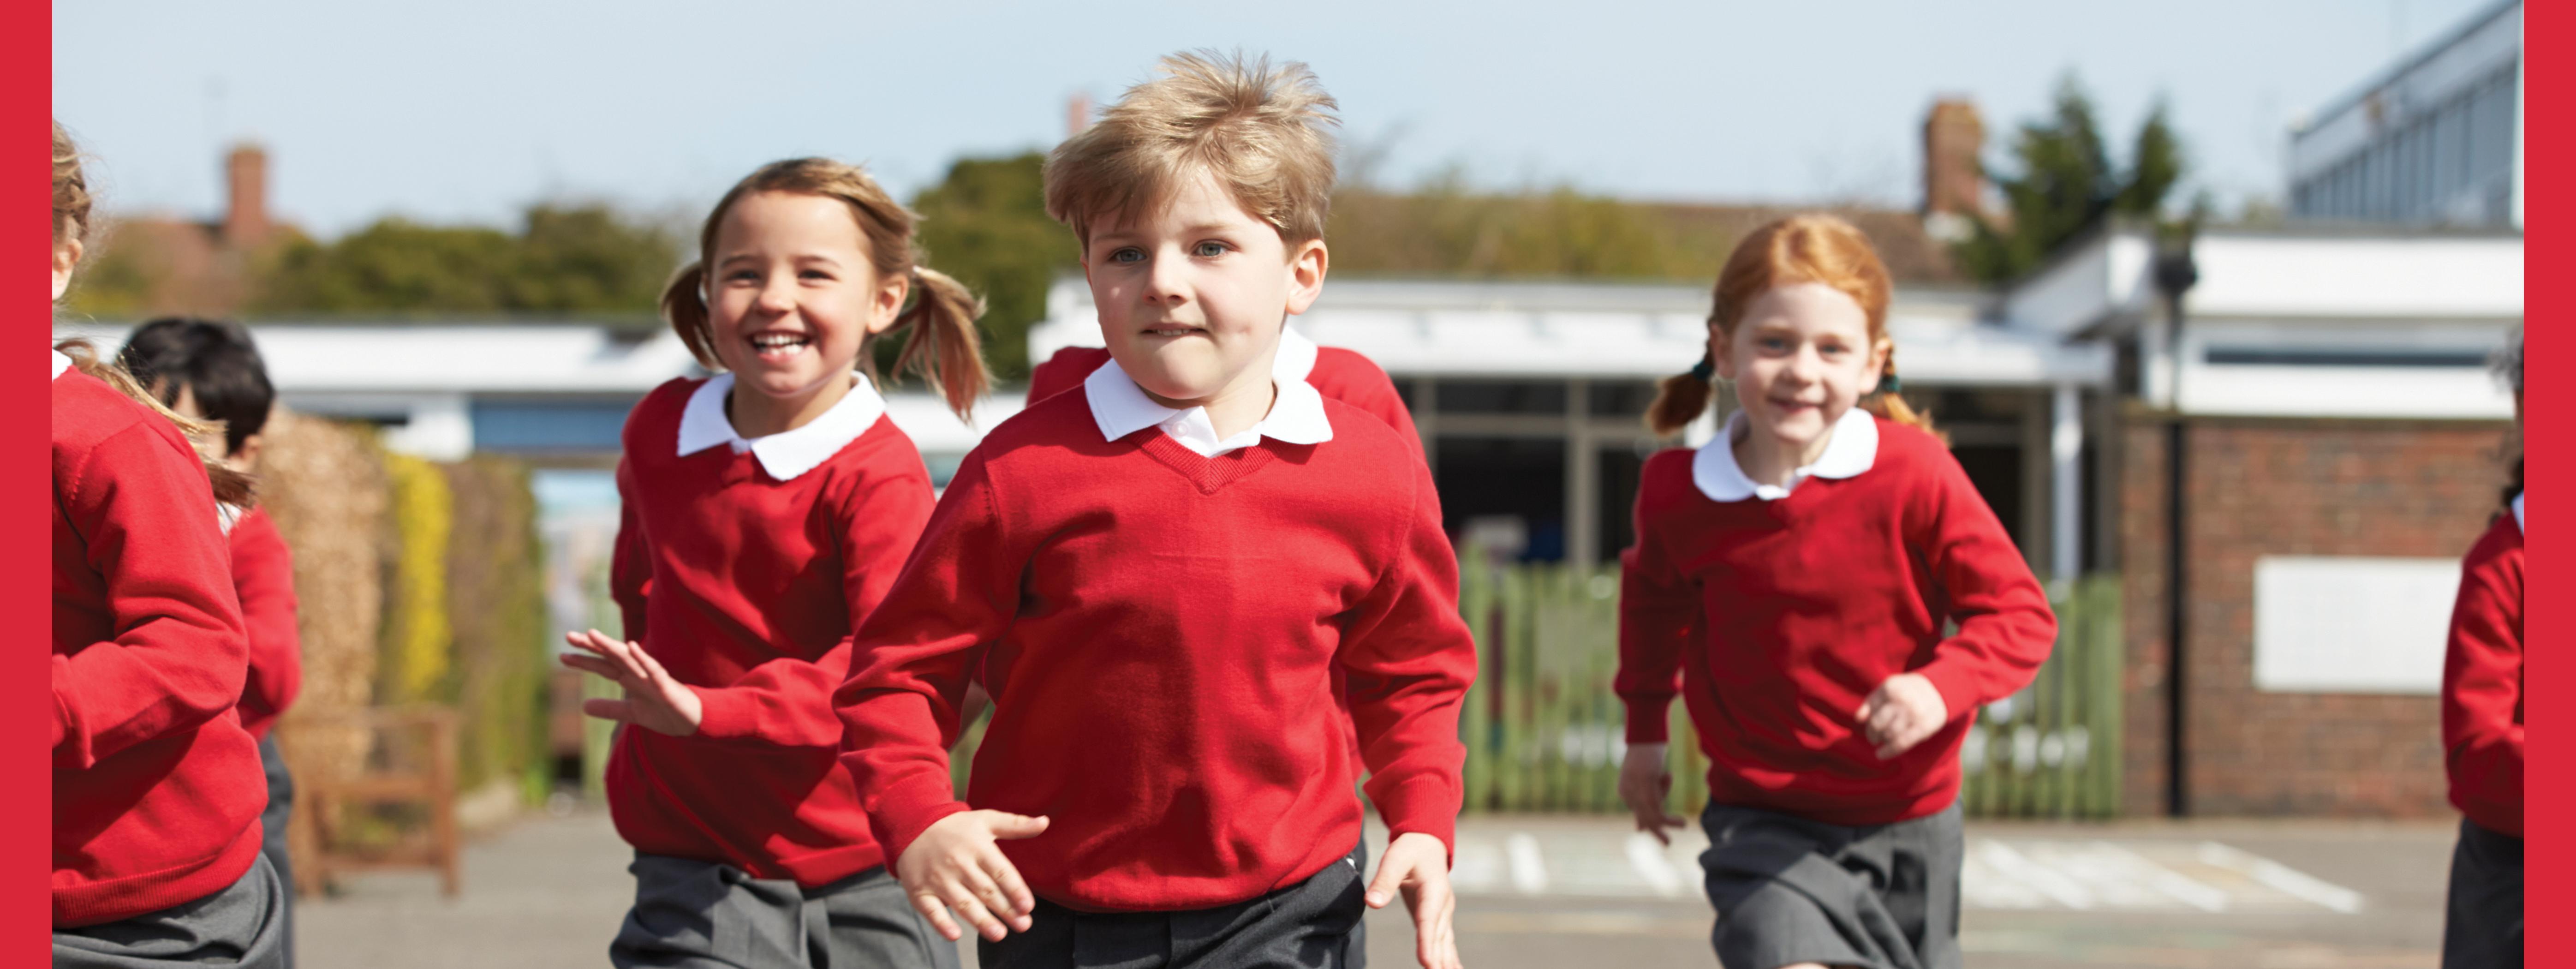 children running - path to assessment